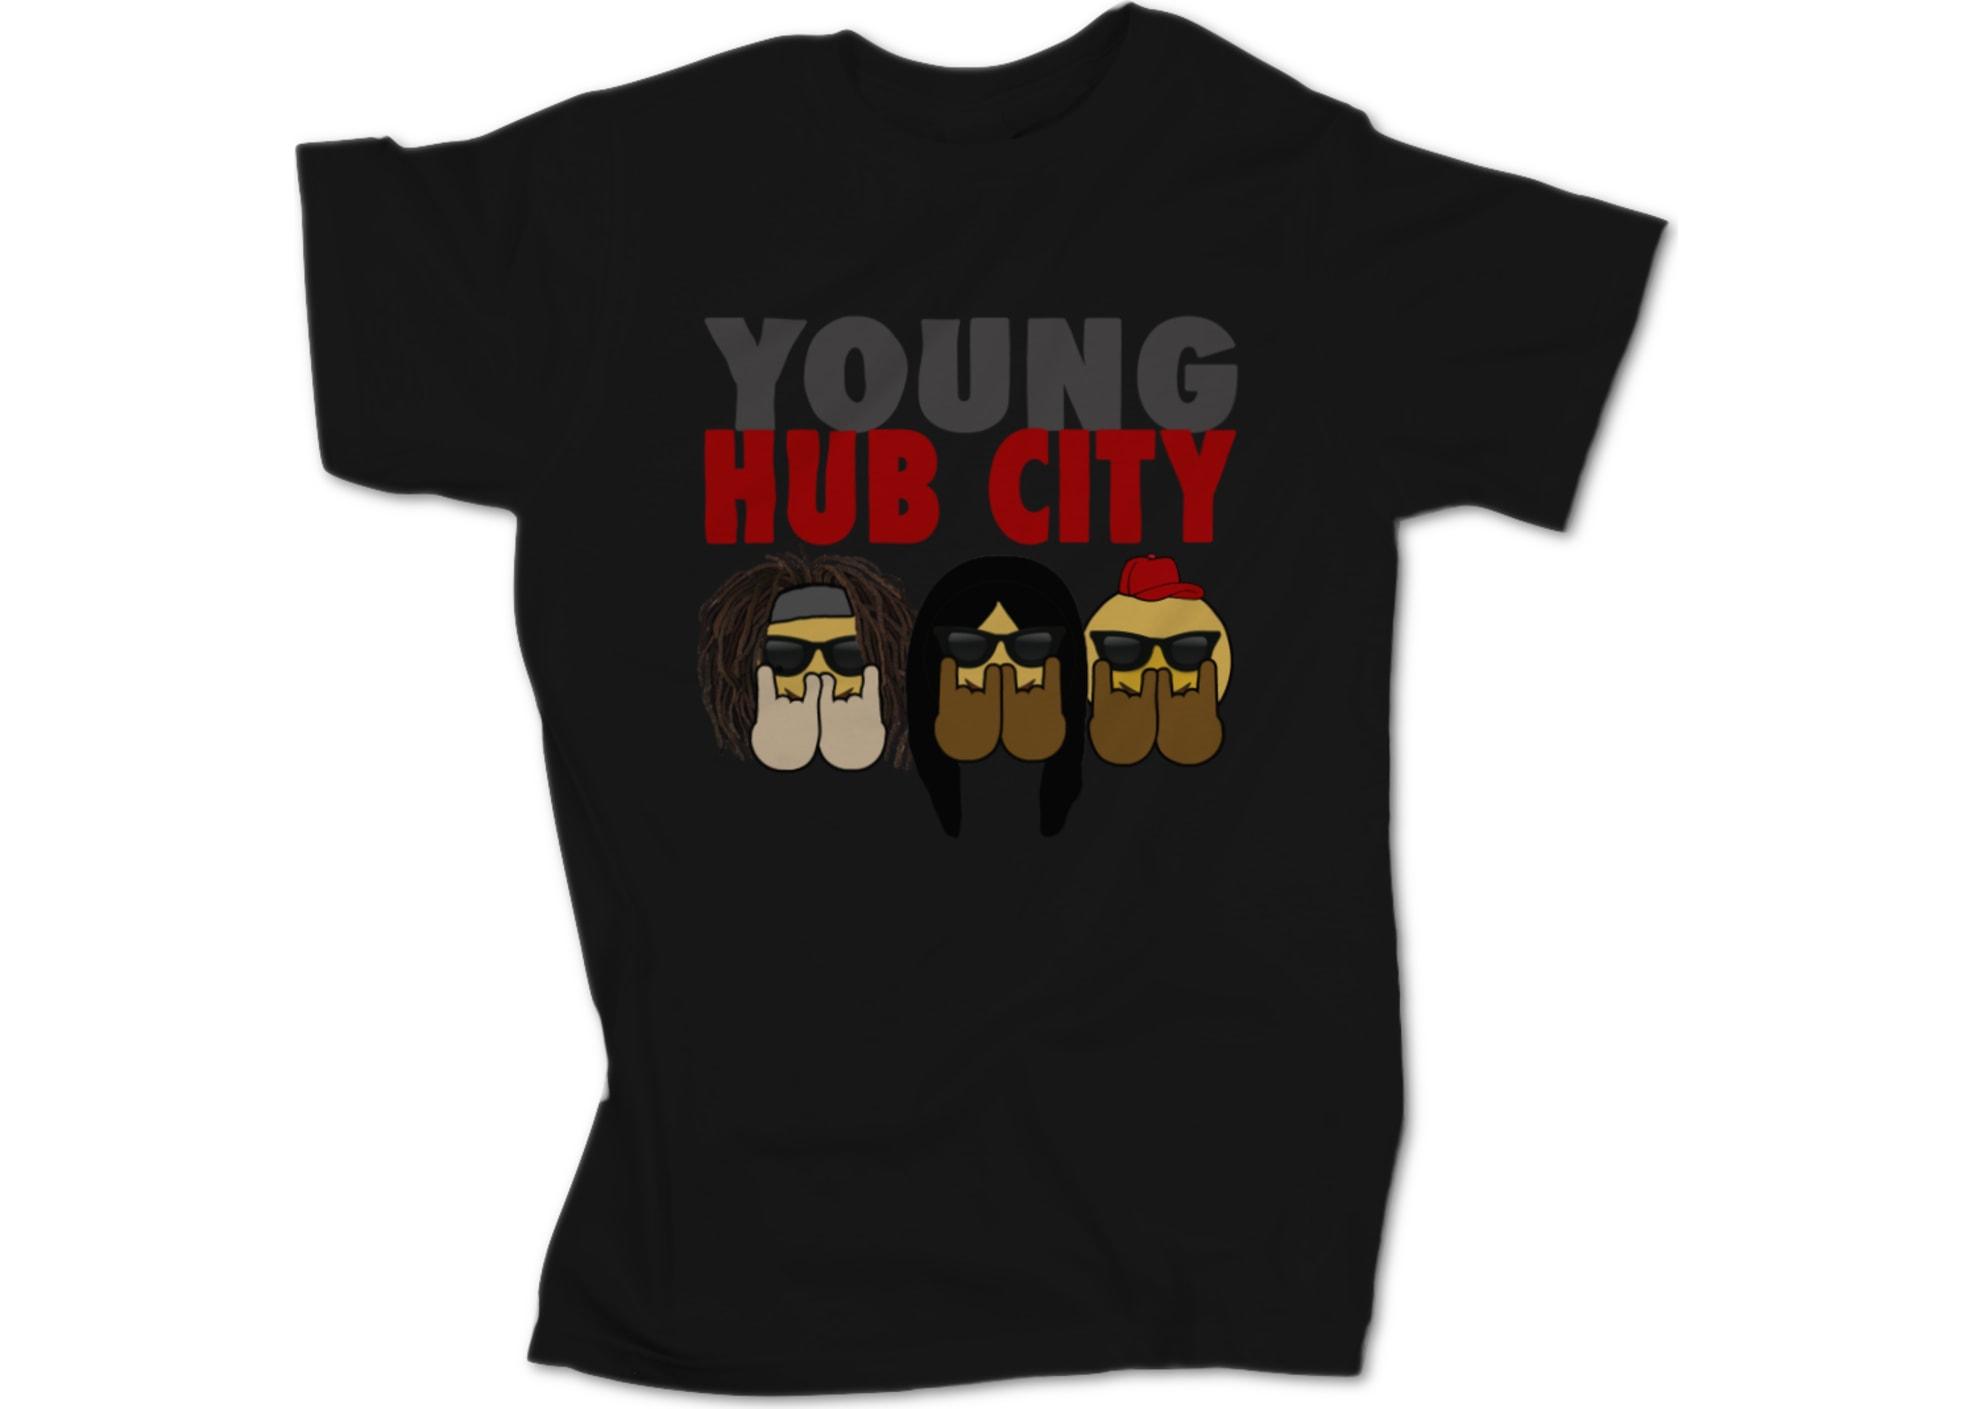 Young hub city yhc emoji 1496691711